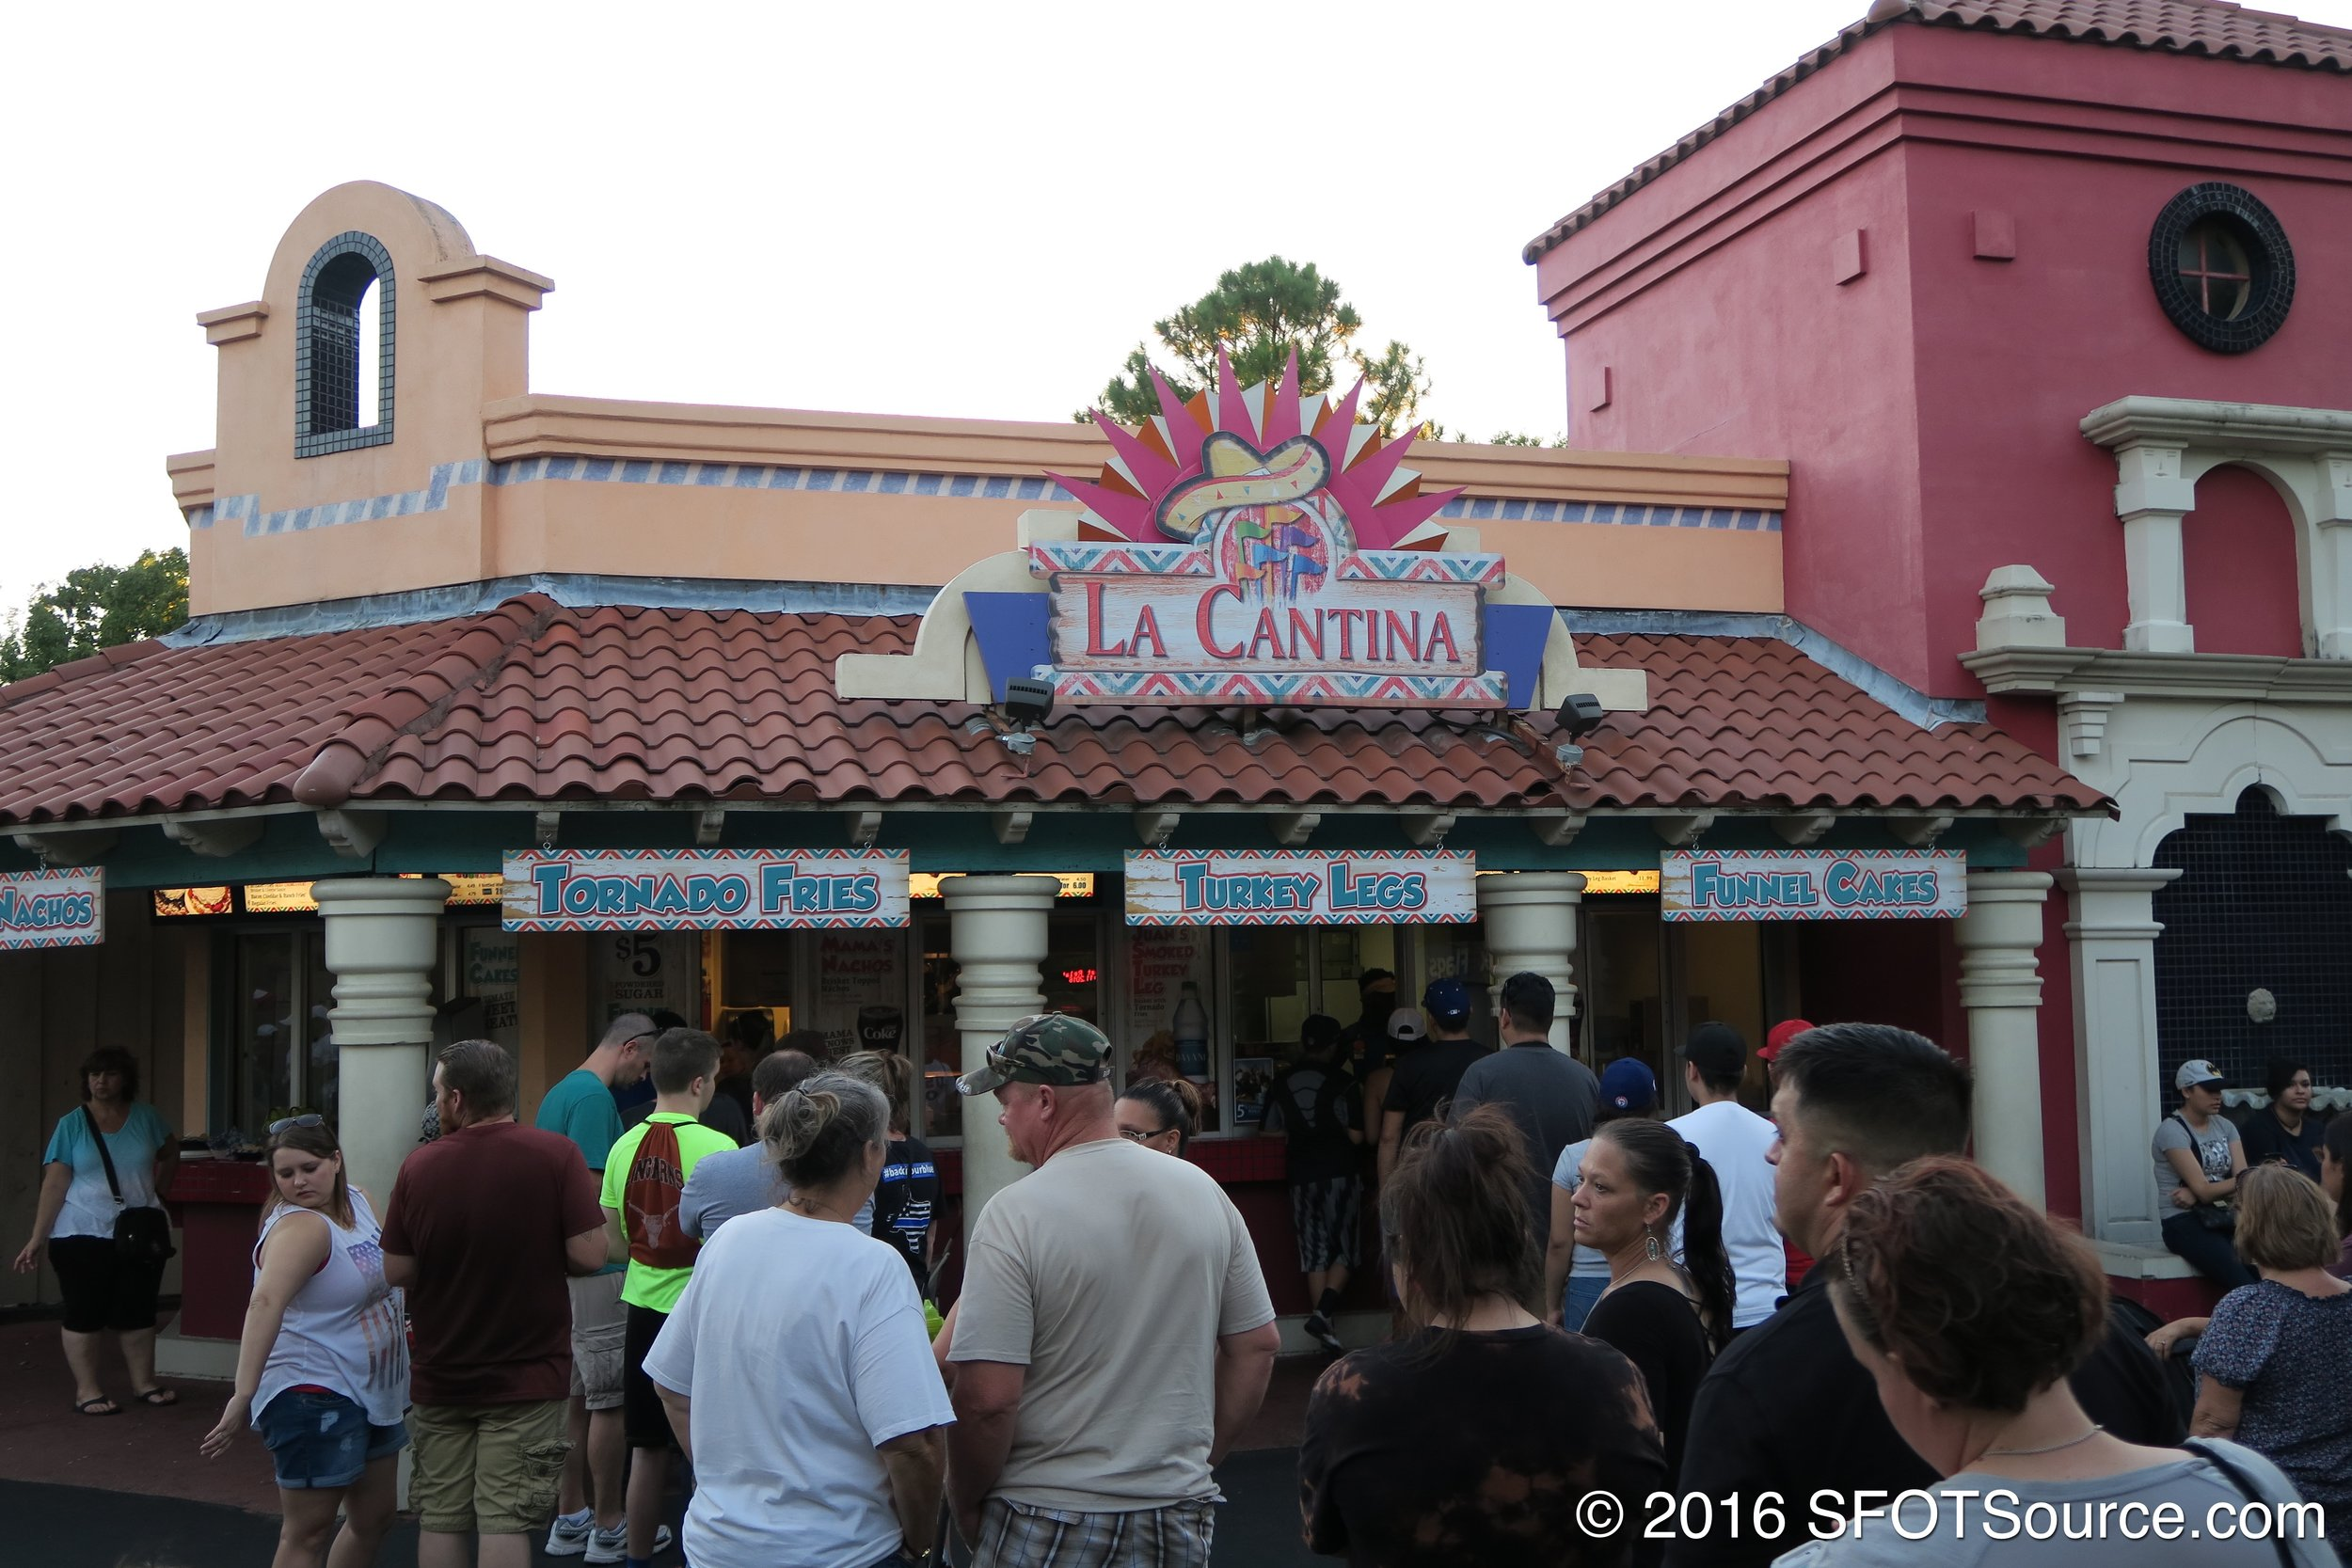 La Cantina is an outdoor restaurant.